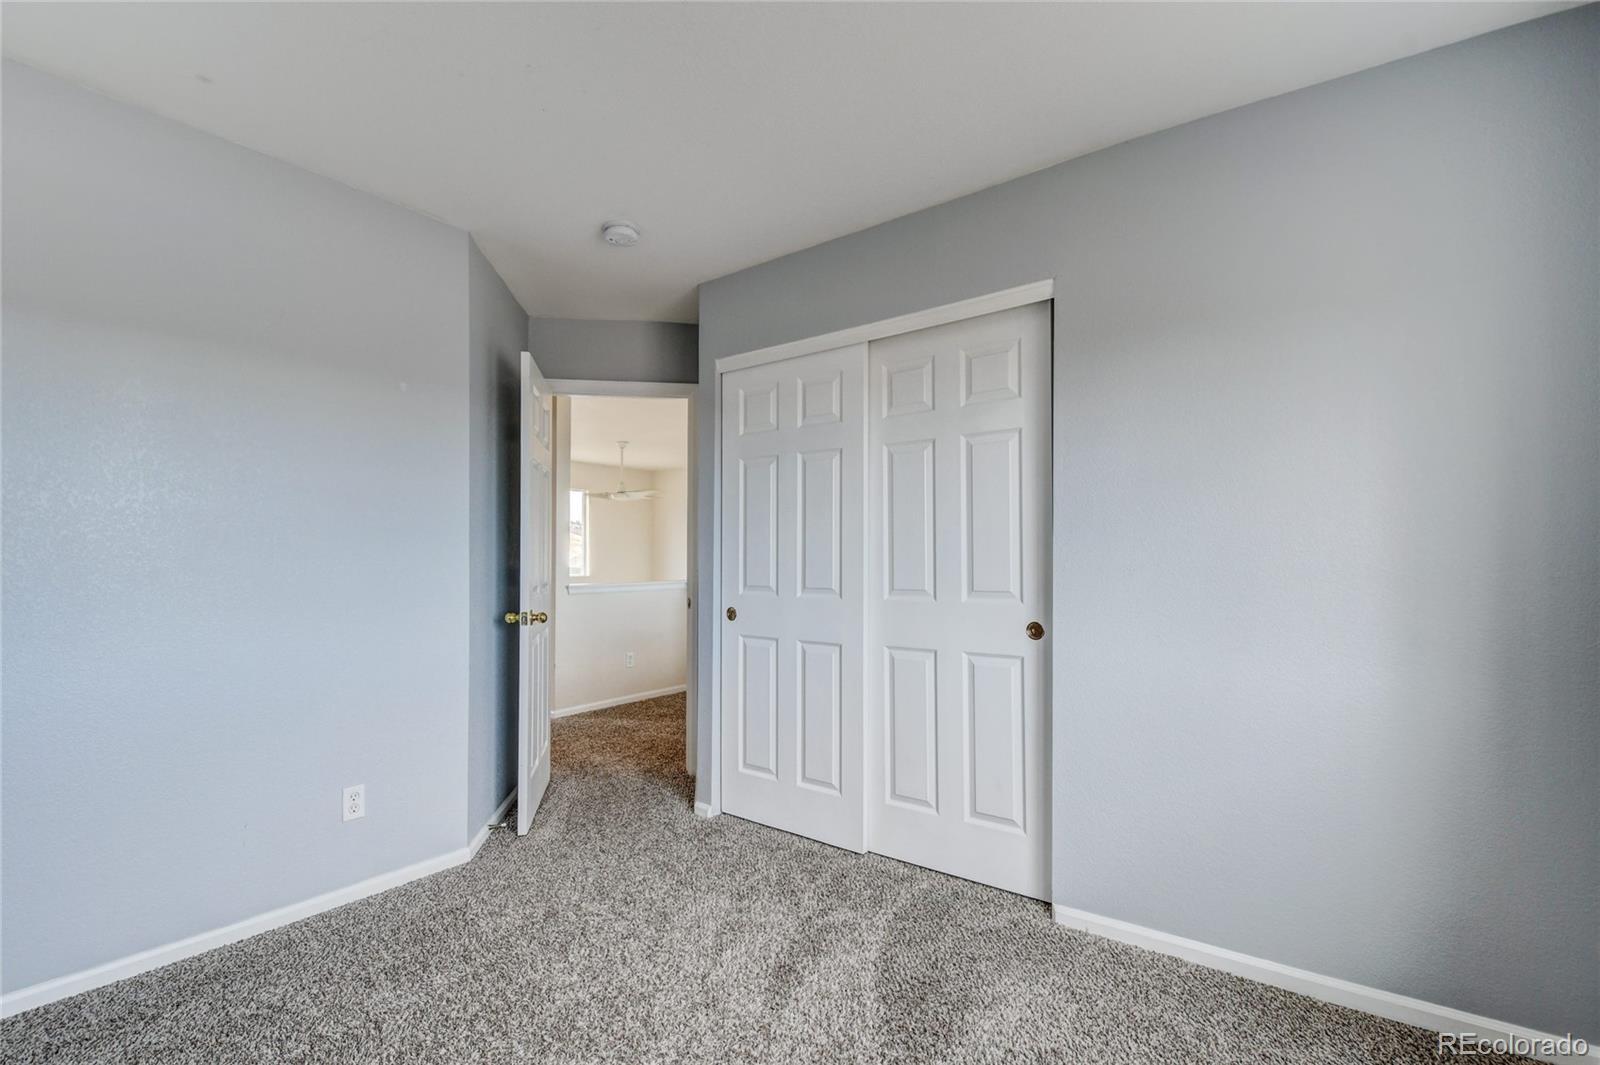 MLS# 2247937 - 21 - 2480 Prairie Lane, Castle Rock, CO 80104